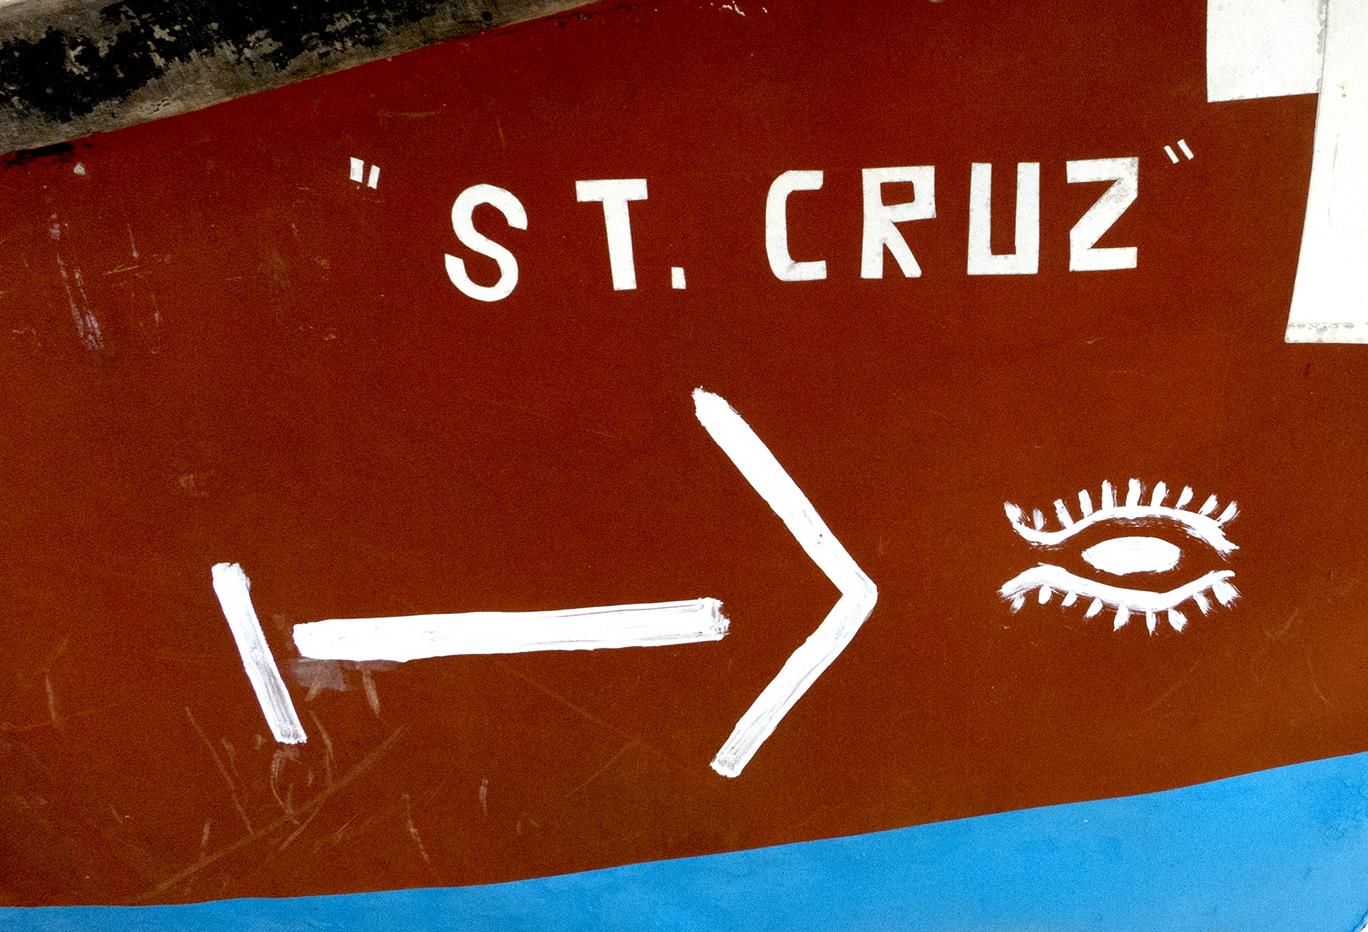 St. Cruz, 2013